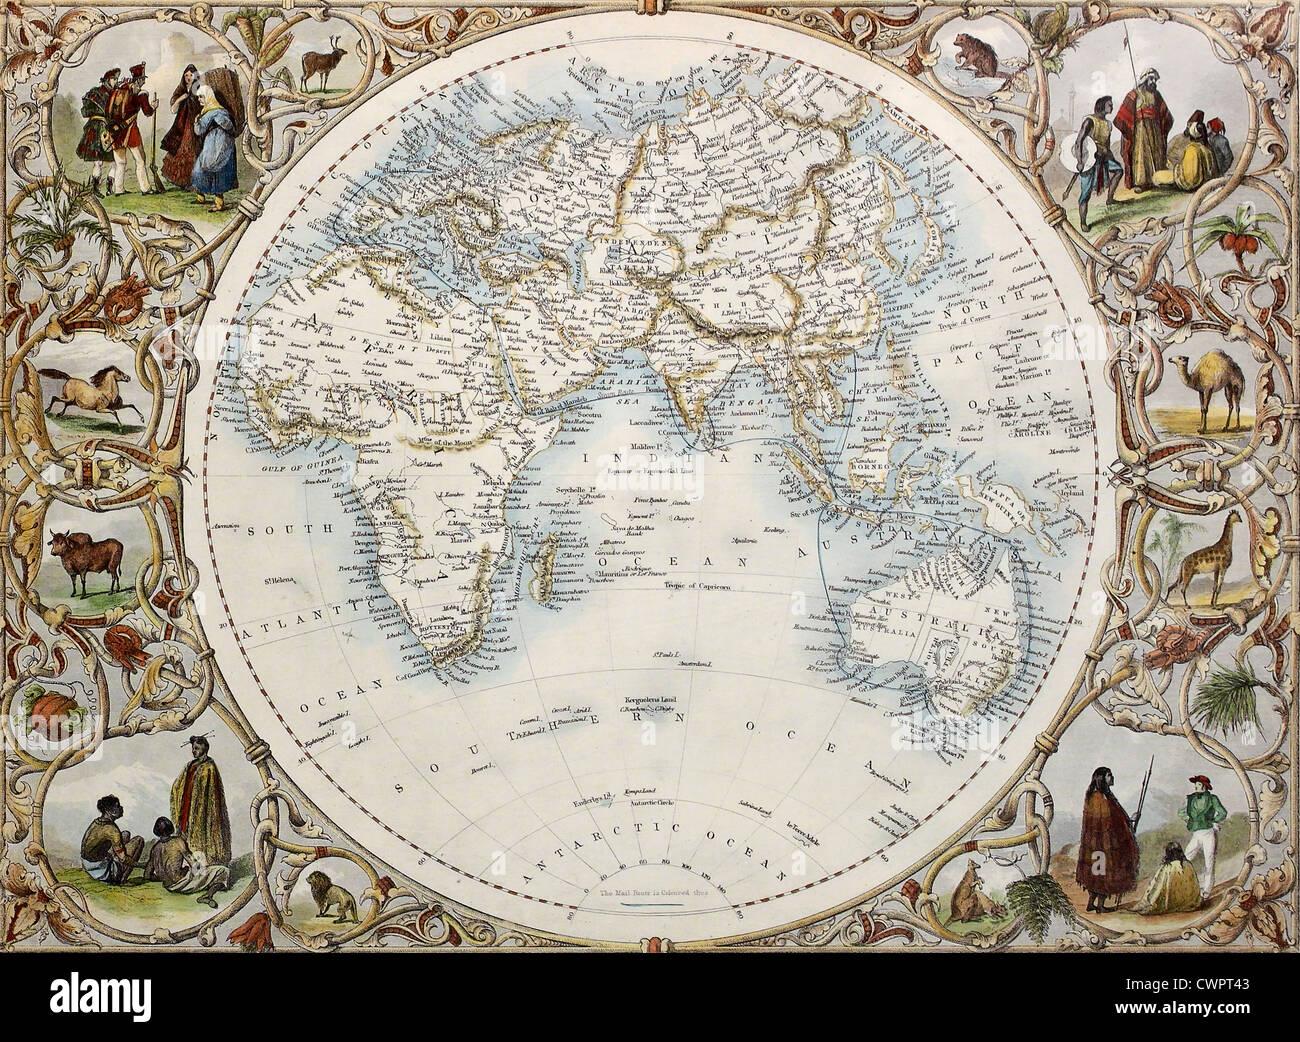 Old map of Hemisphere orienta - Stock Image